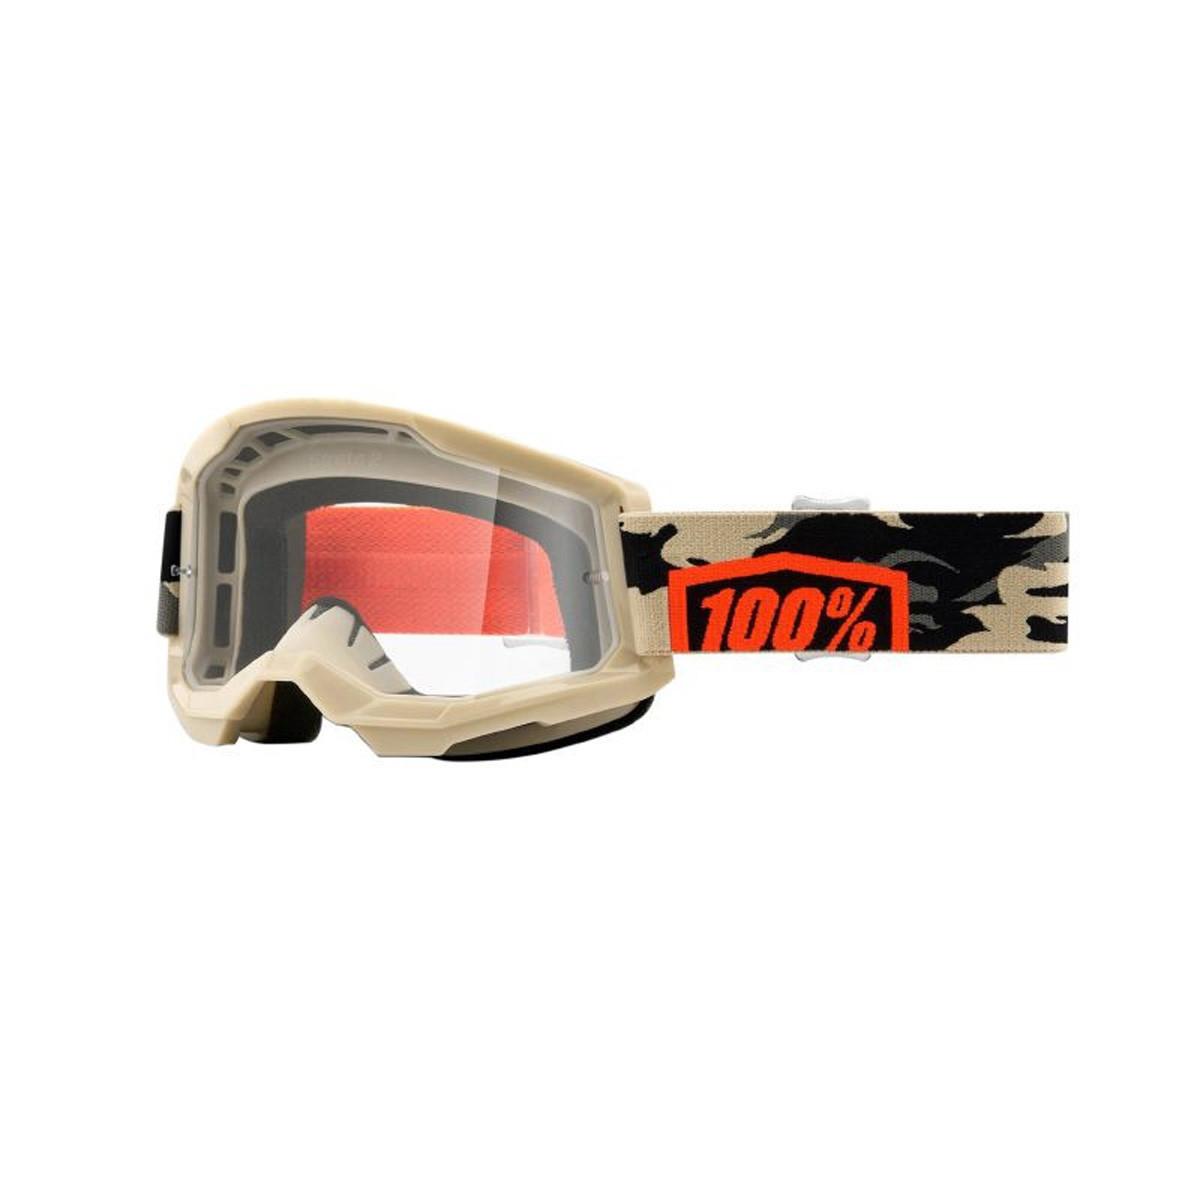 Masque / Lunettes Cross - 100% Strata 2 Kombat Beige Ecran Transparent